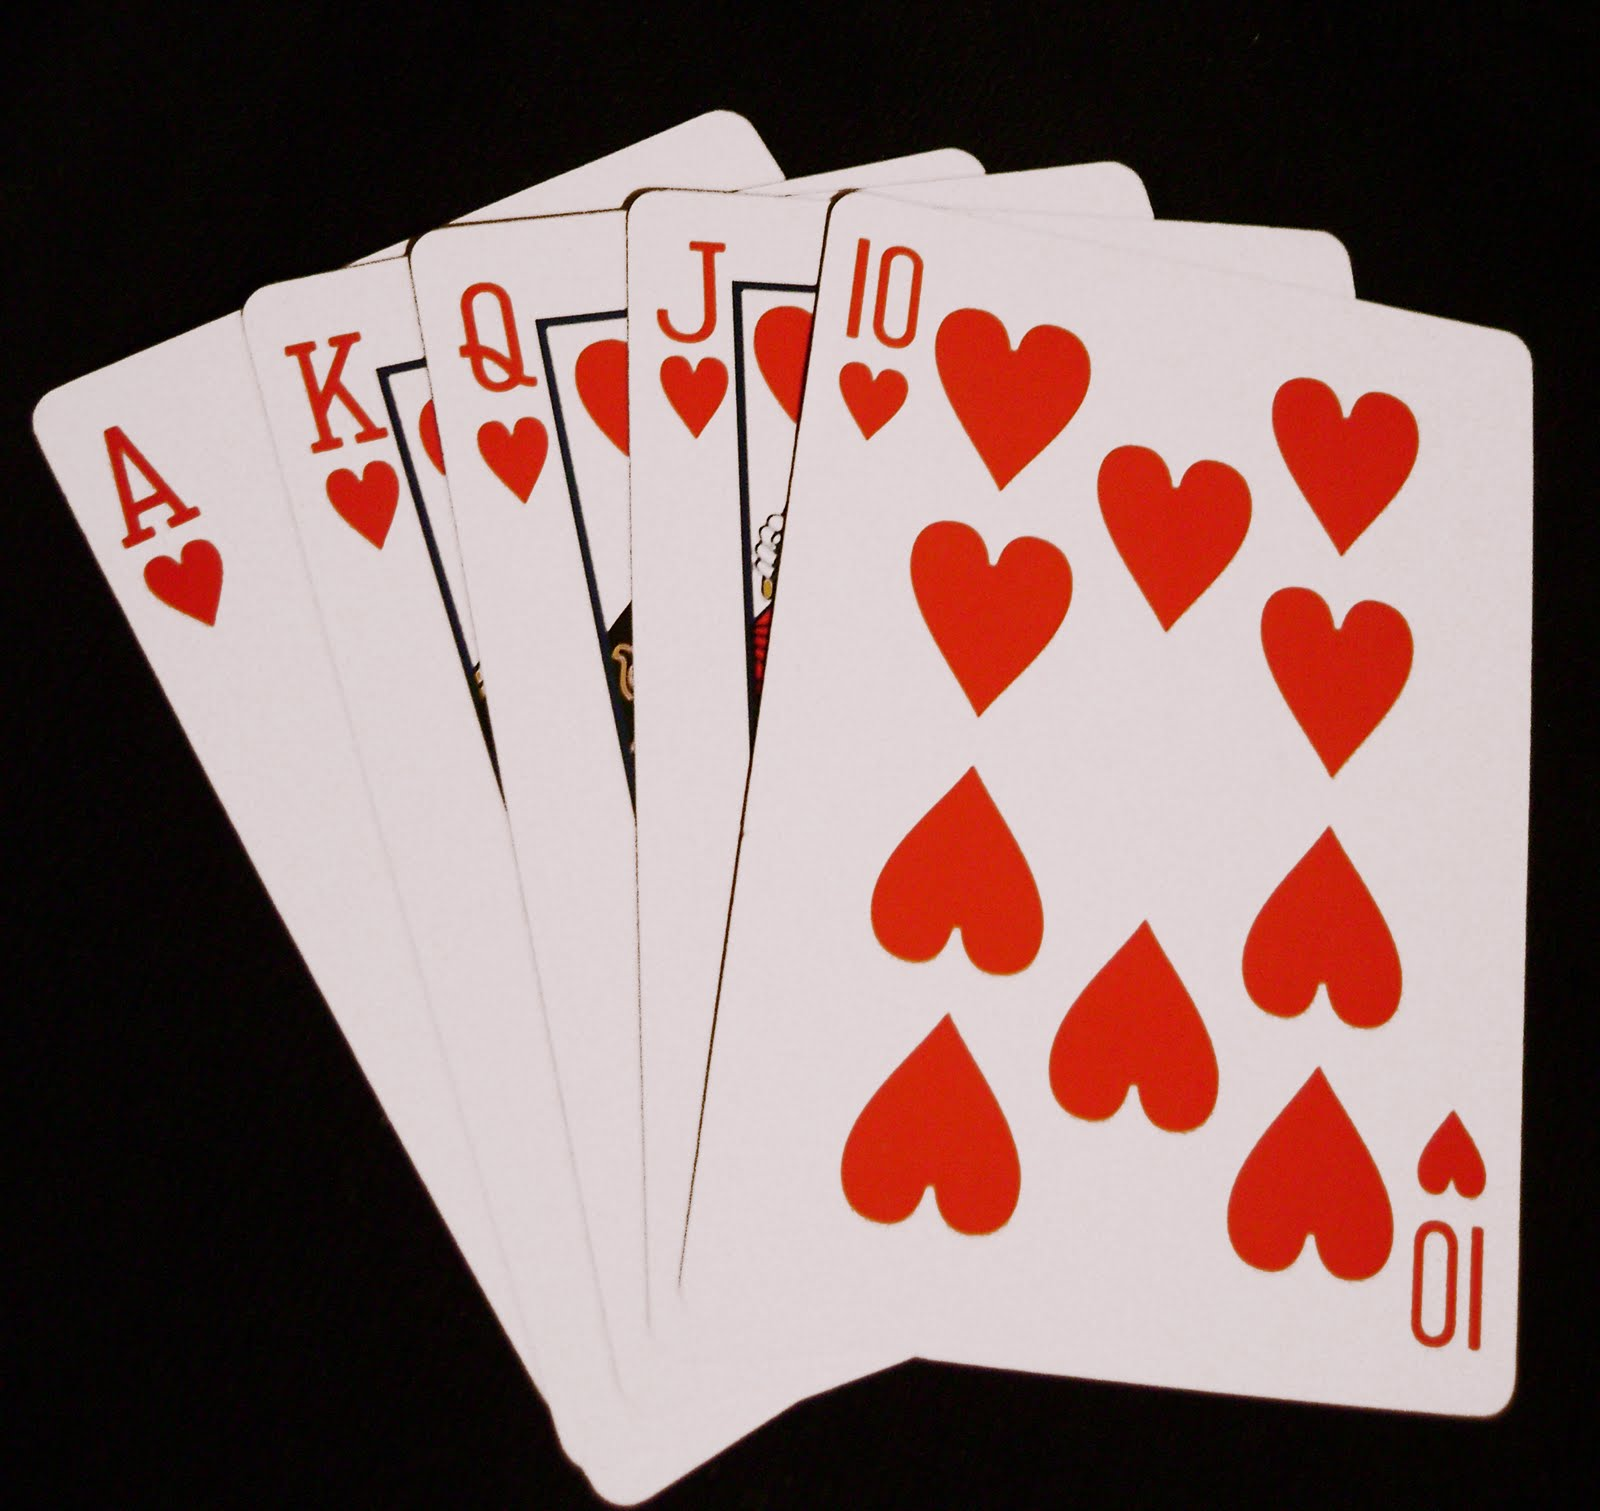 Royal Flush - Hearts Suit Straight Flush (Photo) | ALCHEssMIST Poker